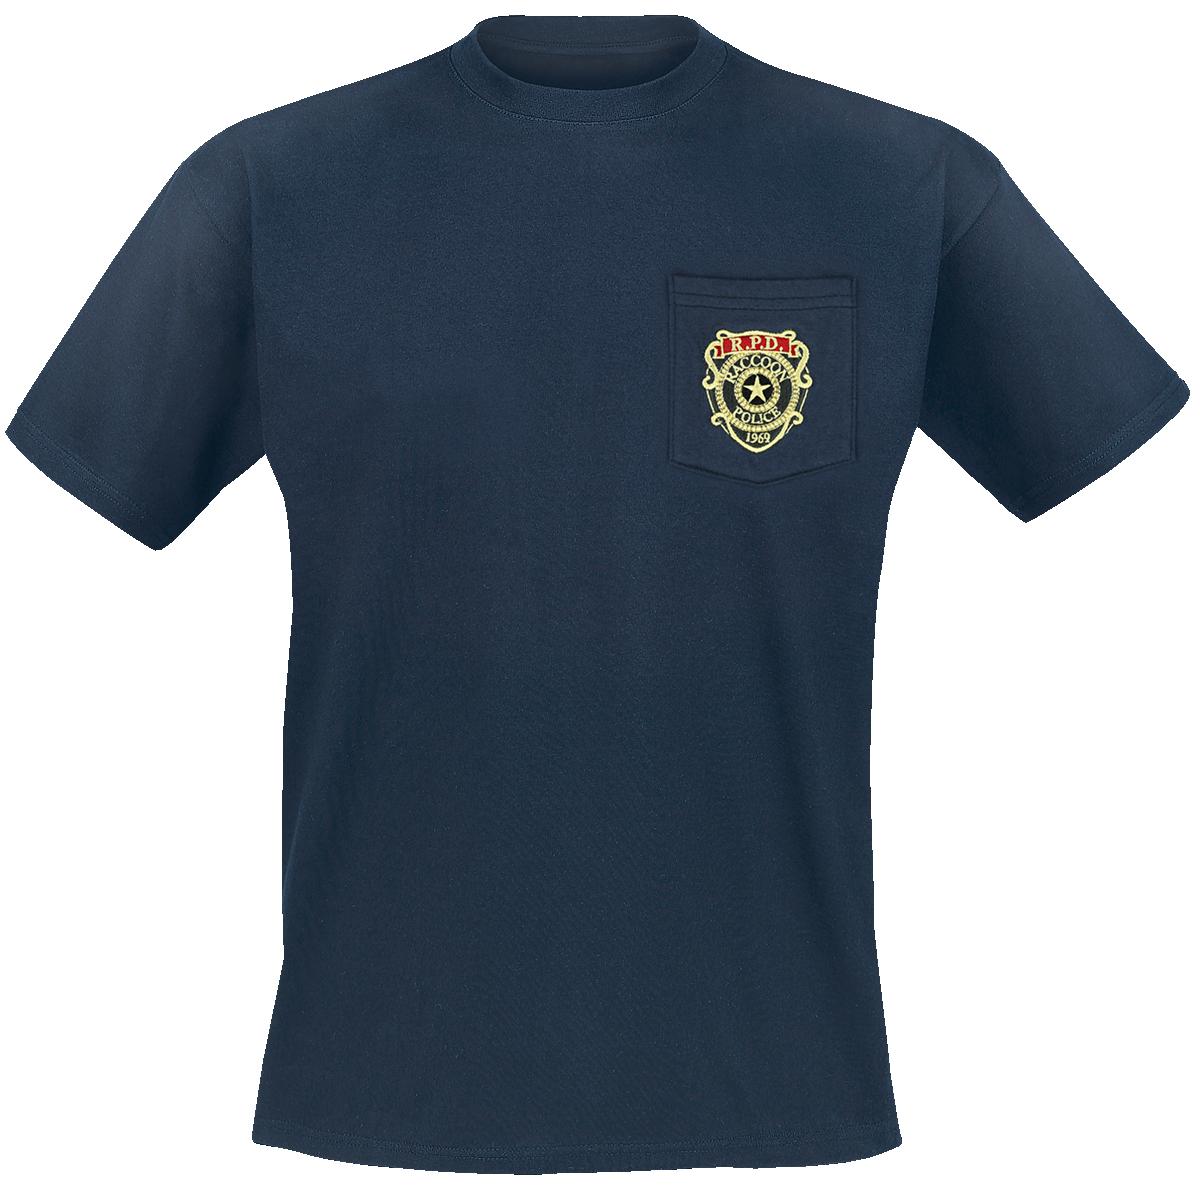 Resident Evil - Raccoon Police Department - Pocket - T-Shirt - blue image